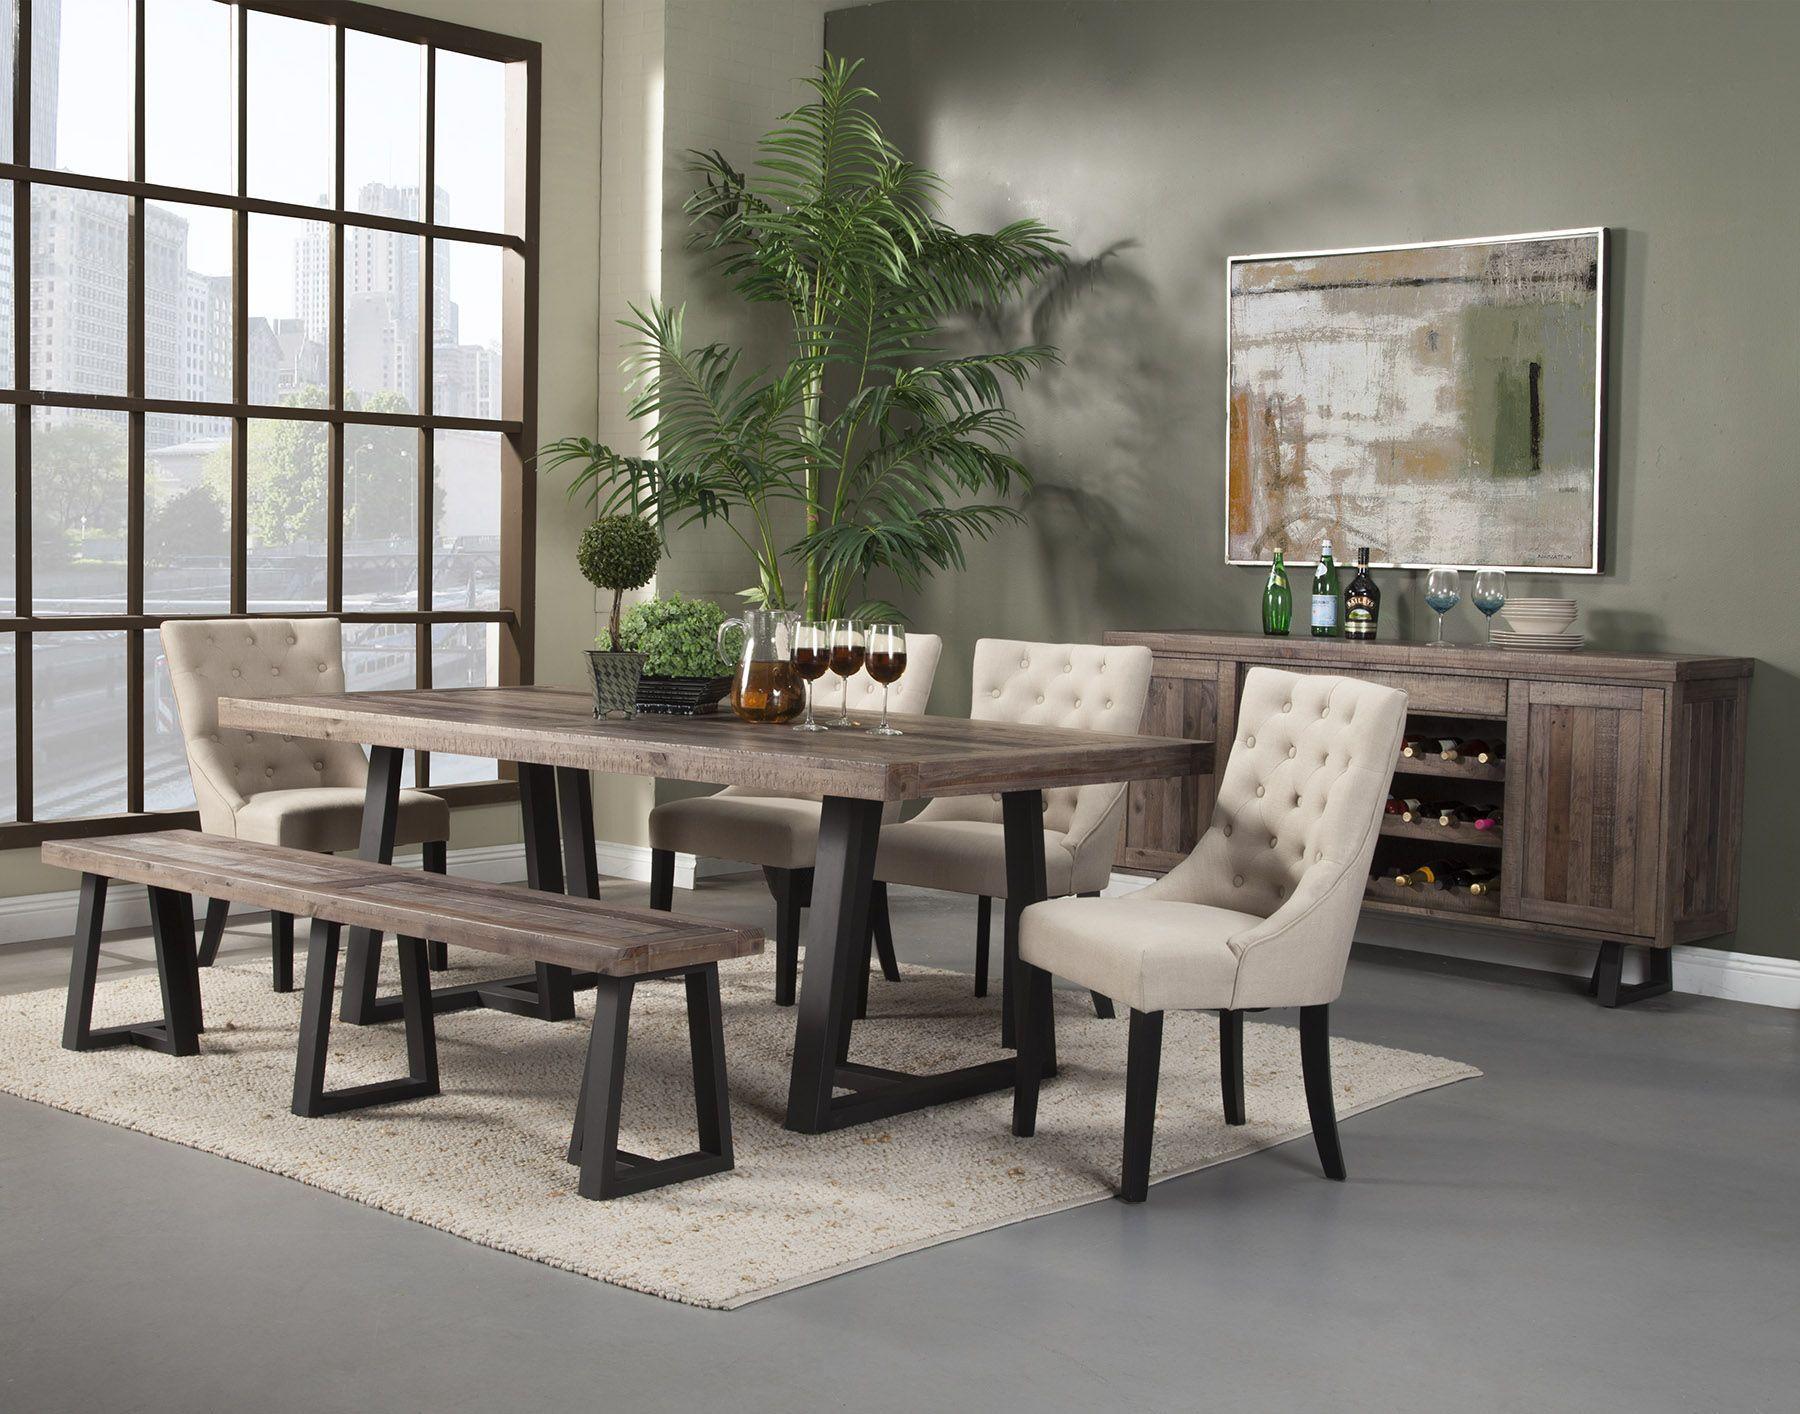 Alpine furniture prairie 7pc rectangular dining set in